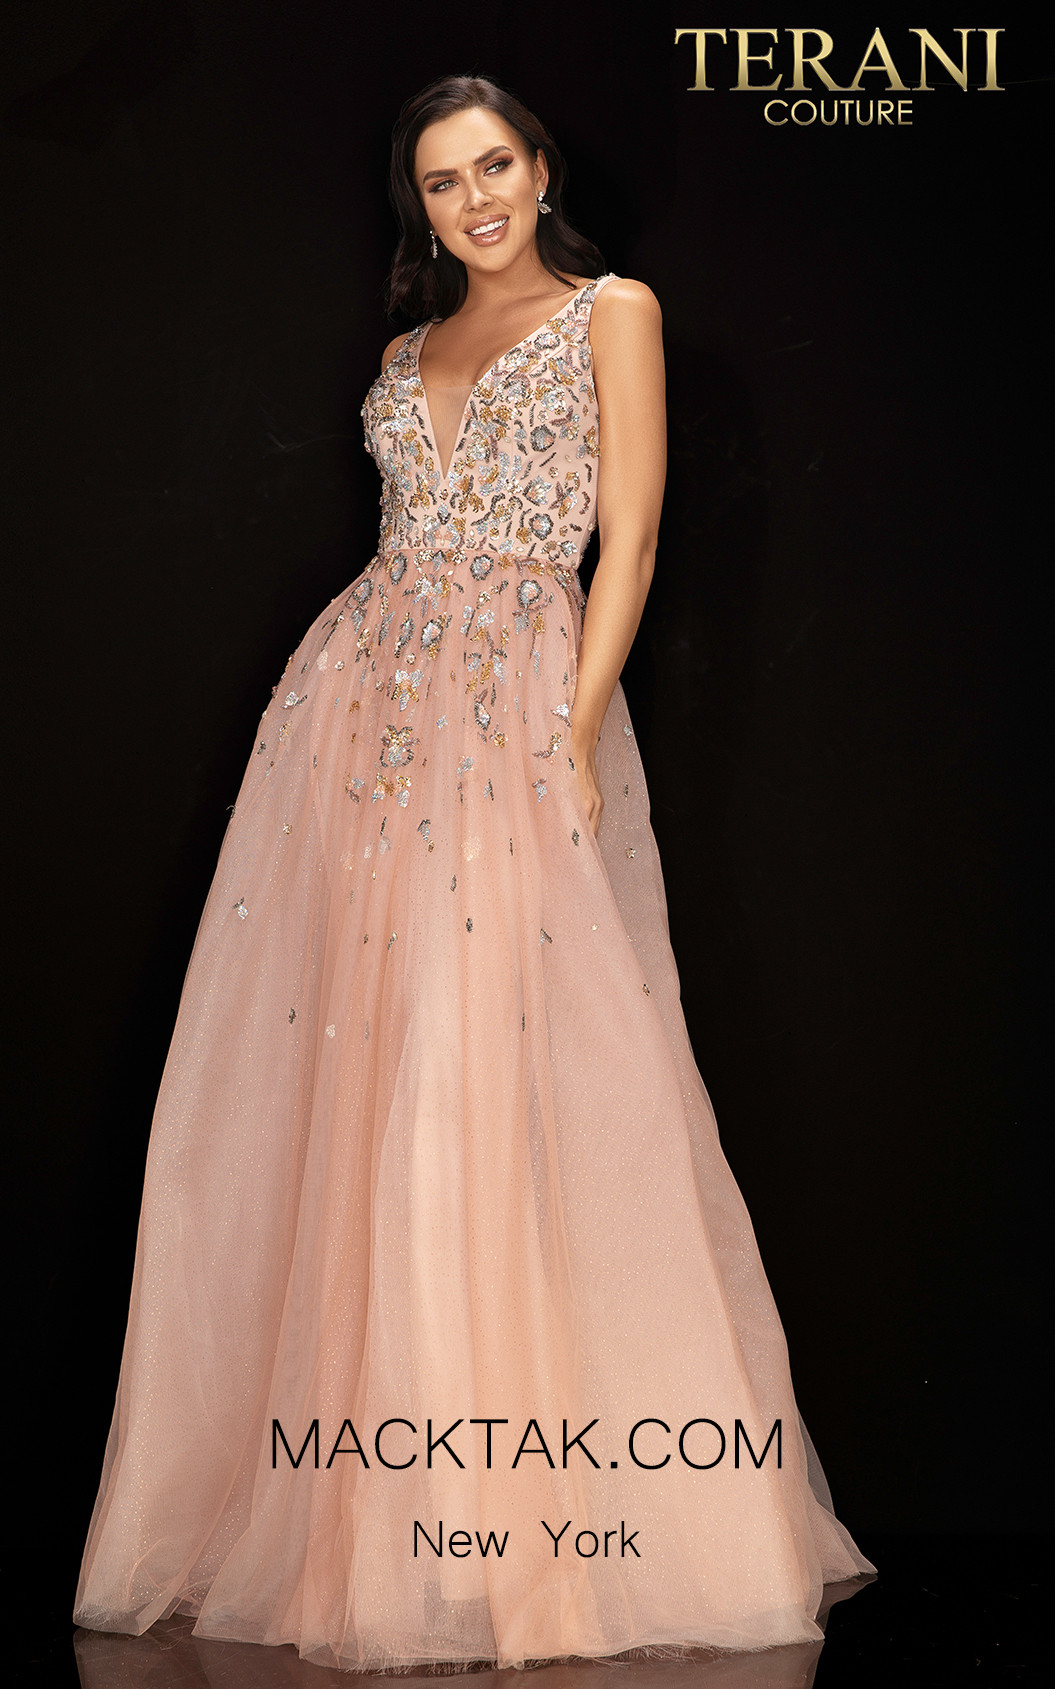 Terani 2011P1205 Blush Front Dress